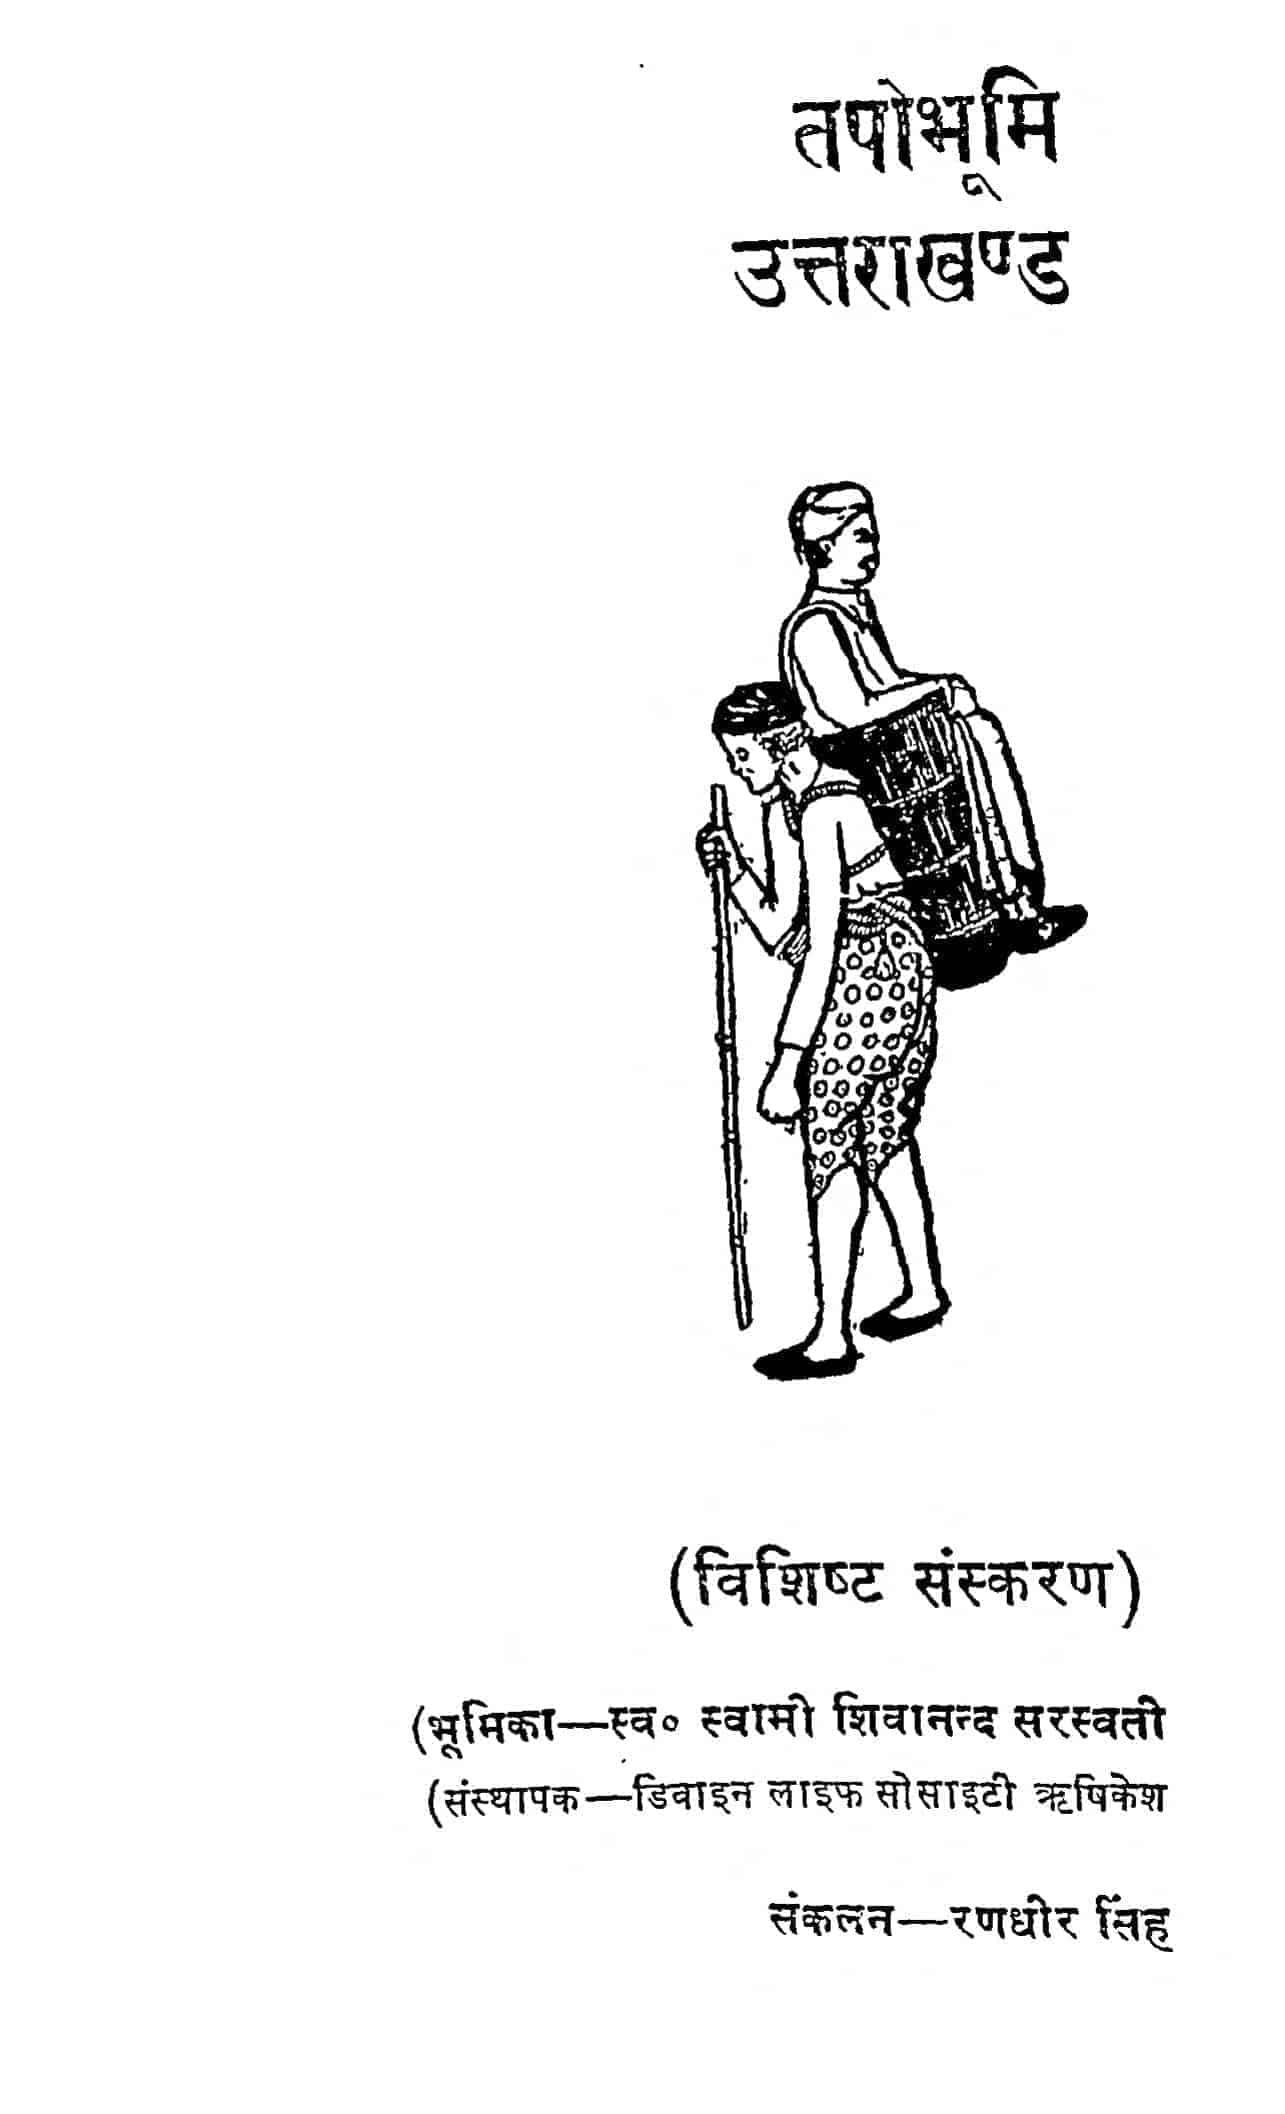 Book Image : तपोभूमि उत्तराखंड - tapobhumi Uttarakhand